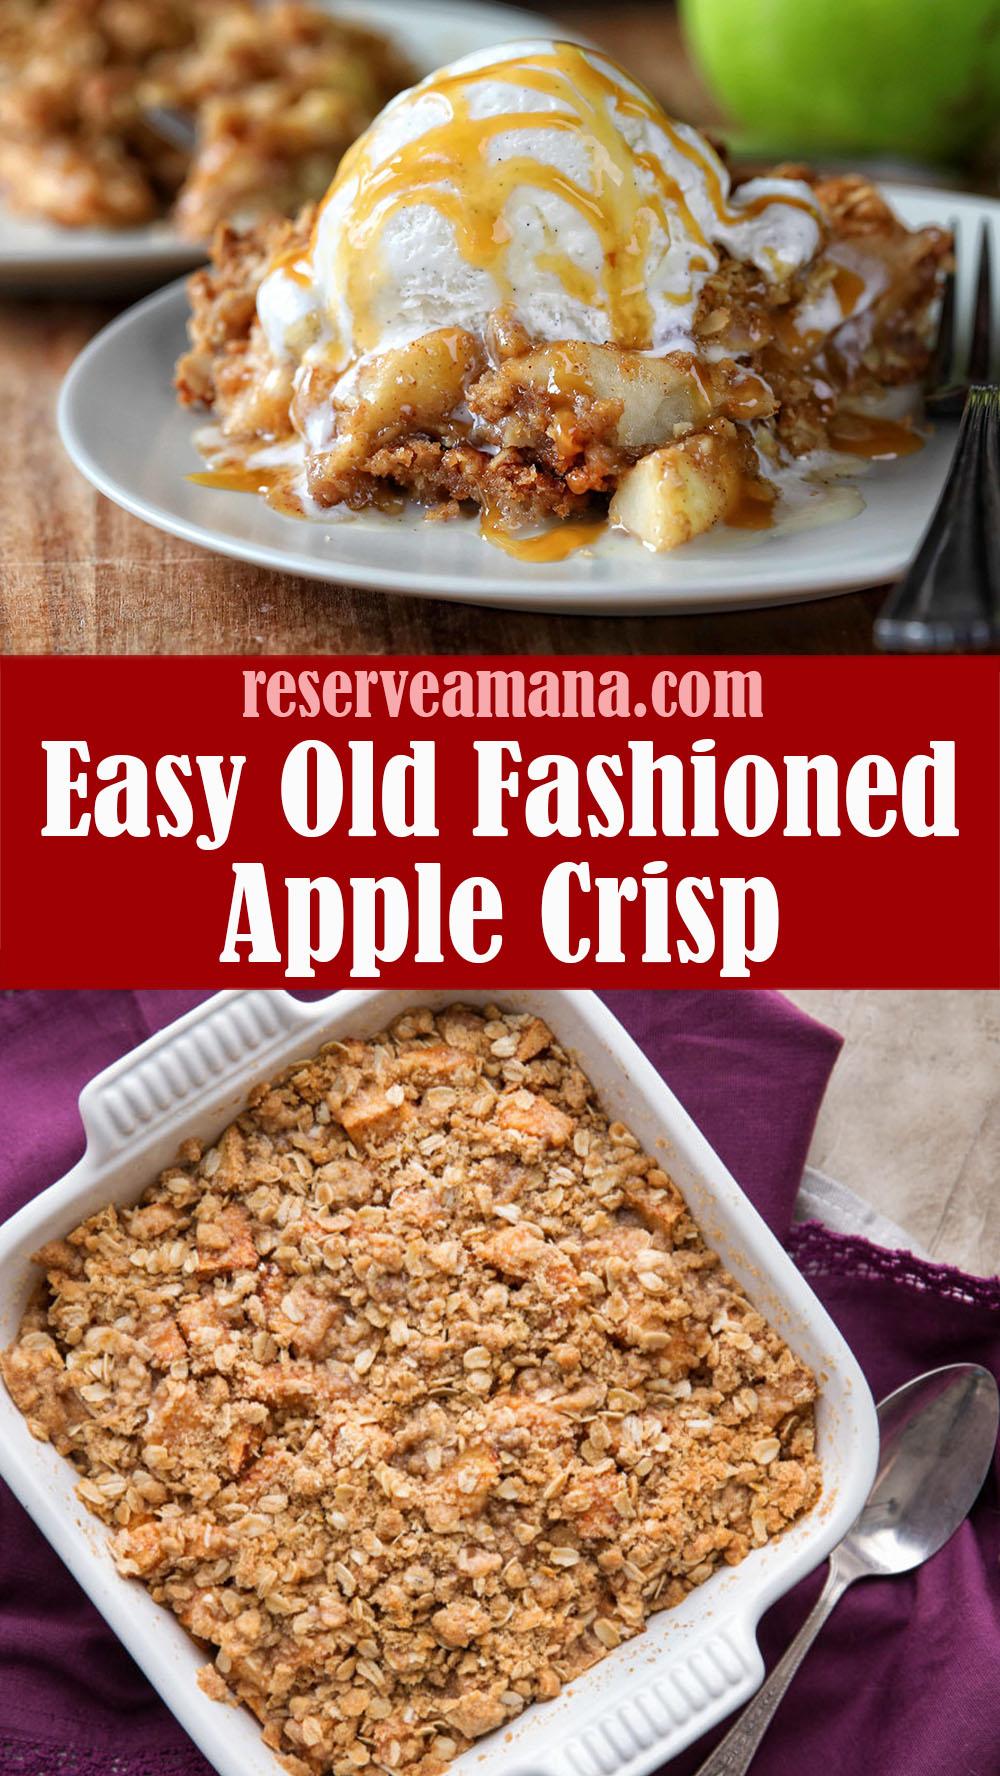 Easy Old Fashioned Apple Crisp